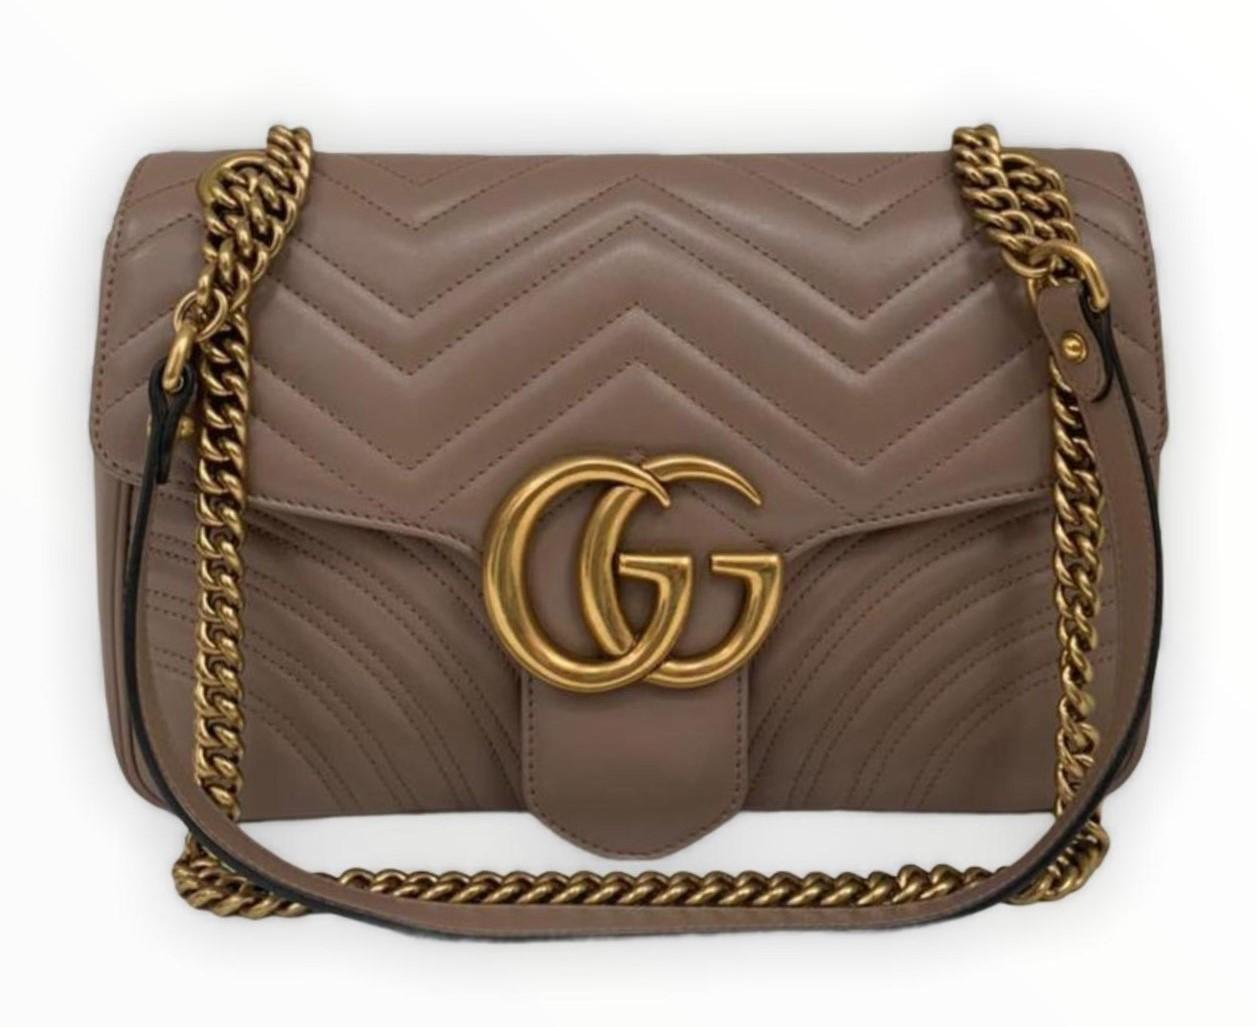 Bolsa Gucci GG Marmont Matelassé